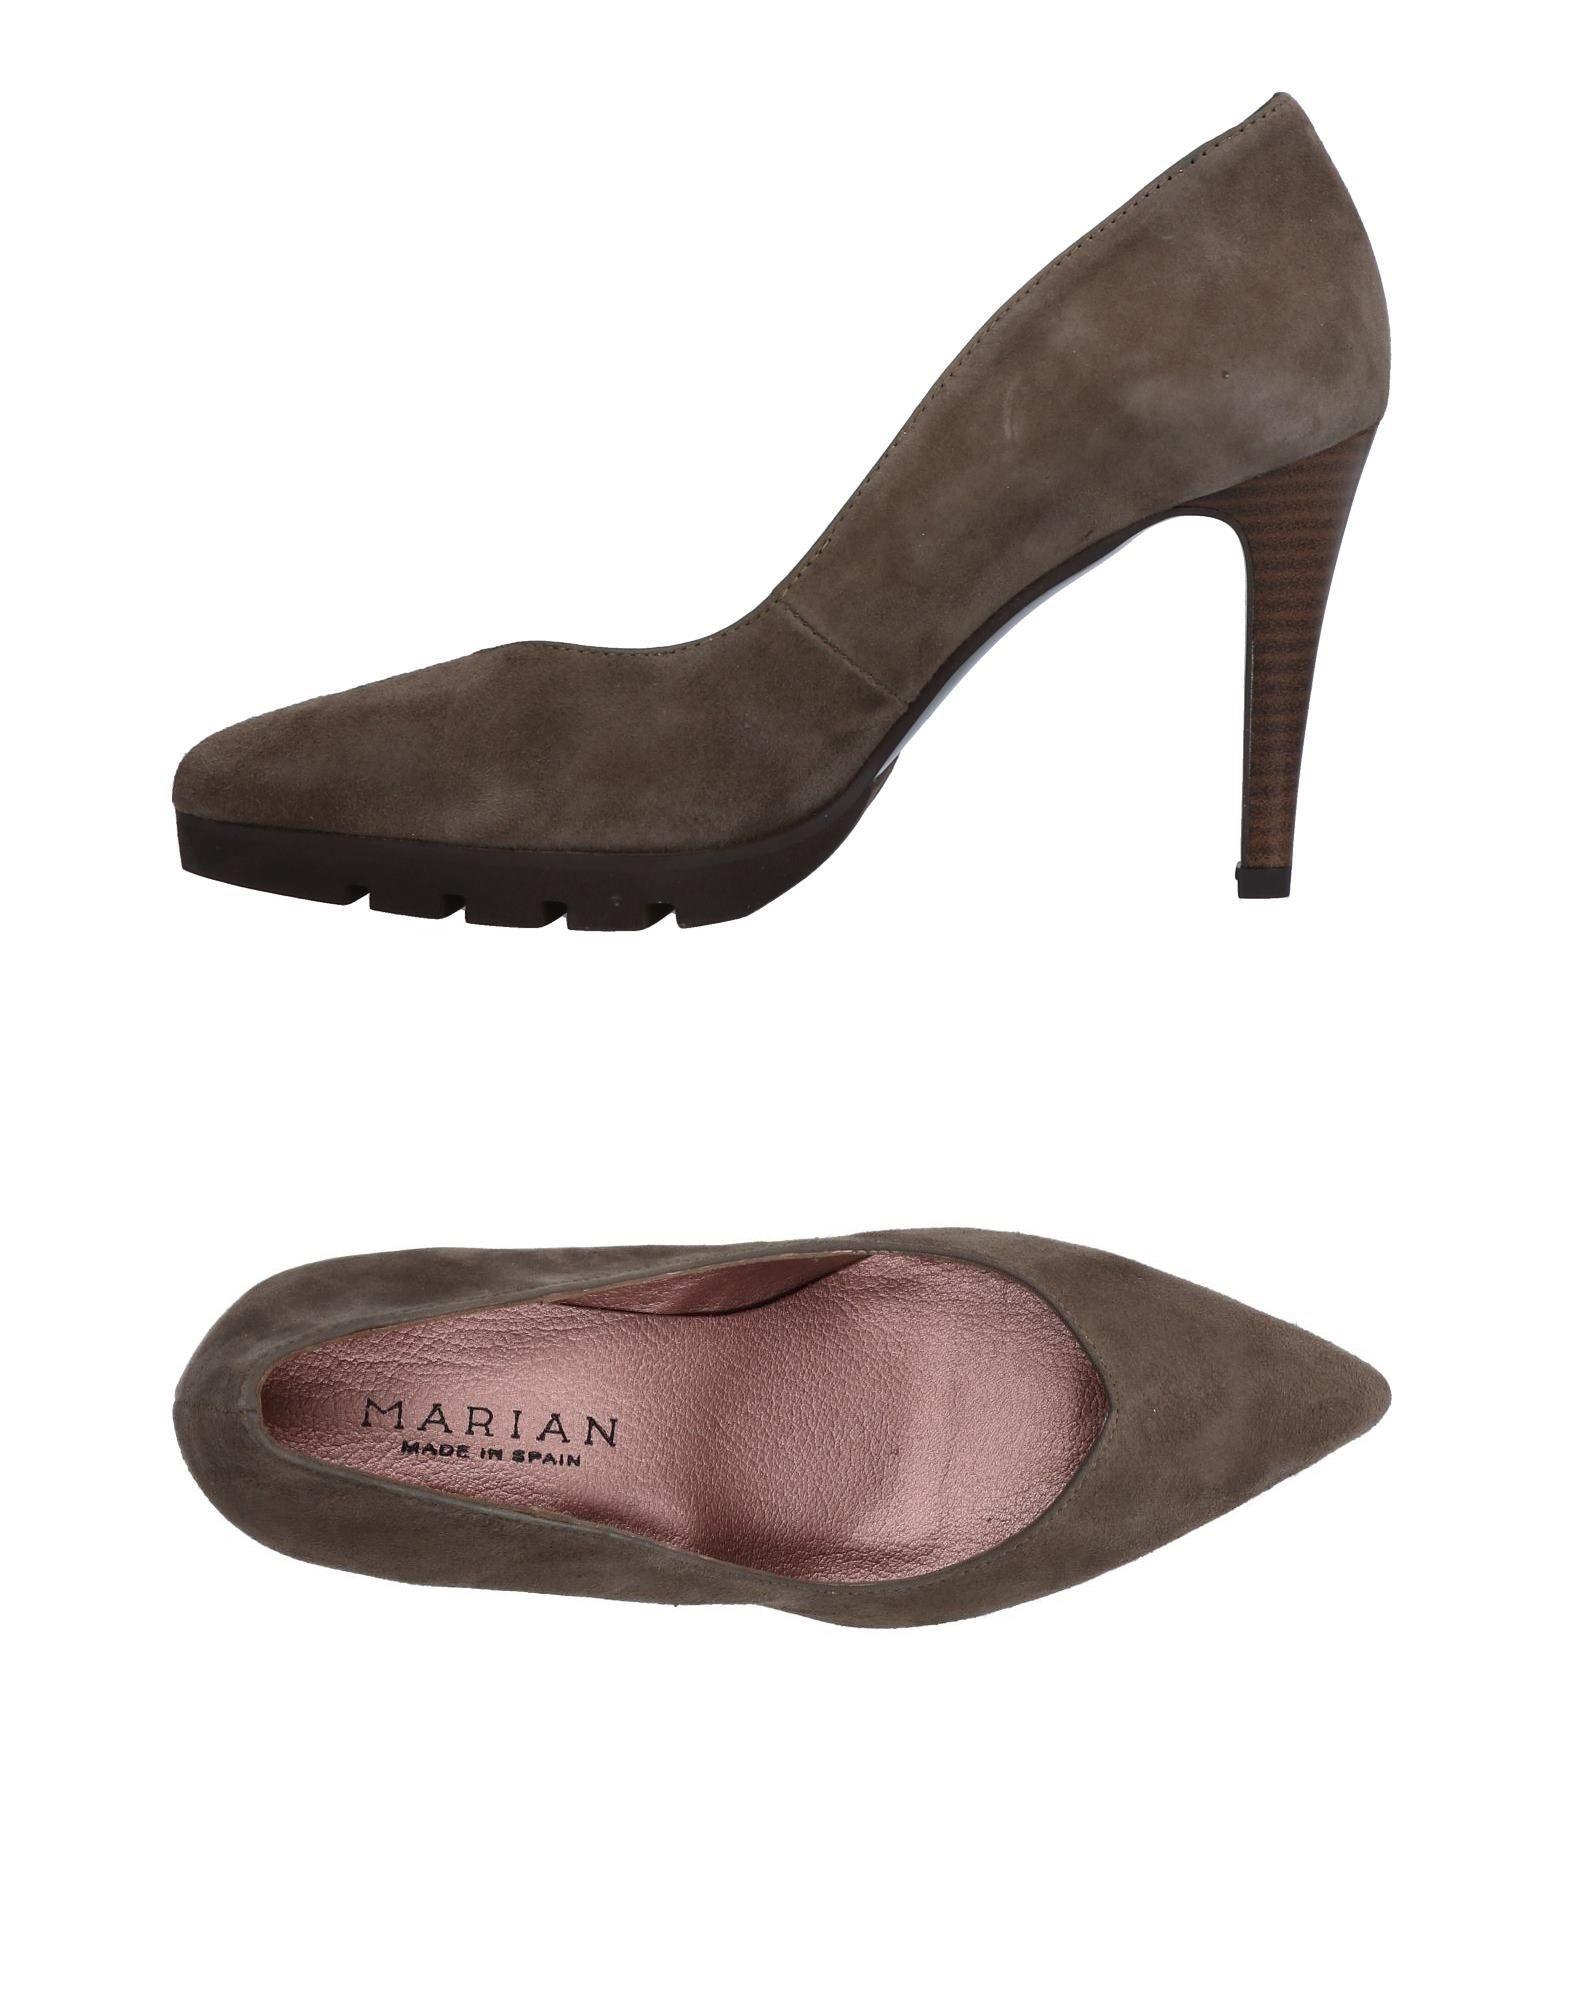 Sandali Fiorangelo offerte Donna - 11378401QC Nuove offerte Fiorangelo e scarpe comode ad5f48